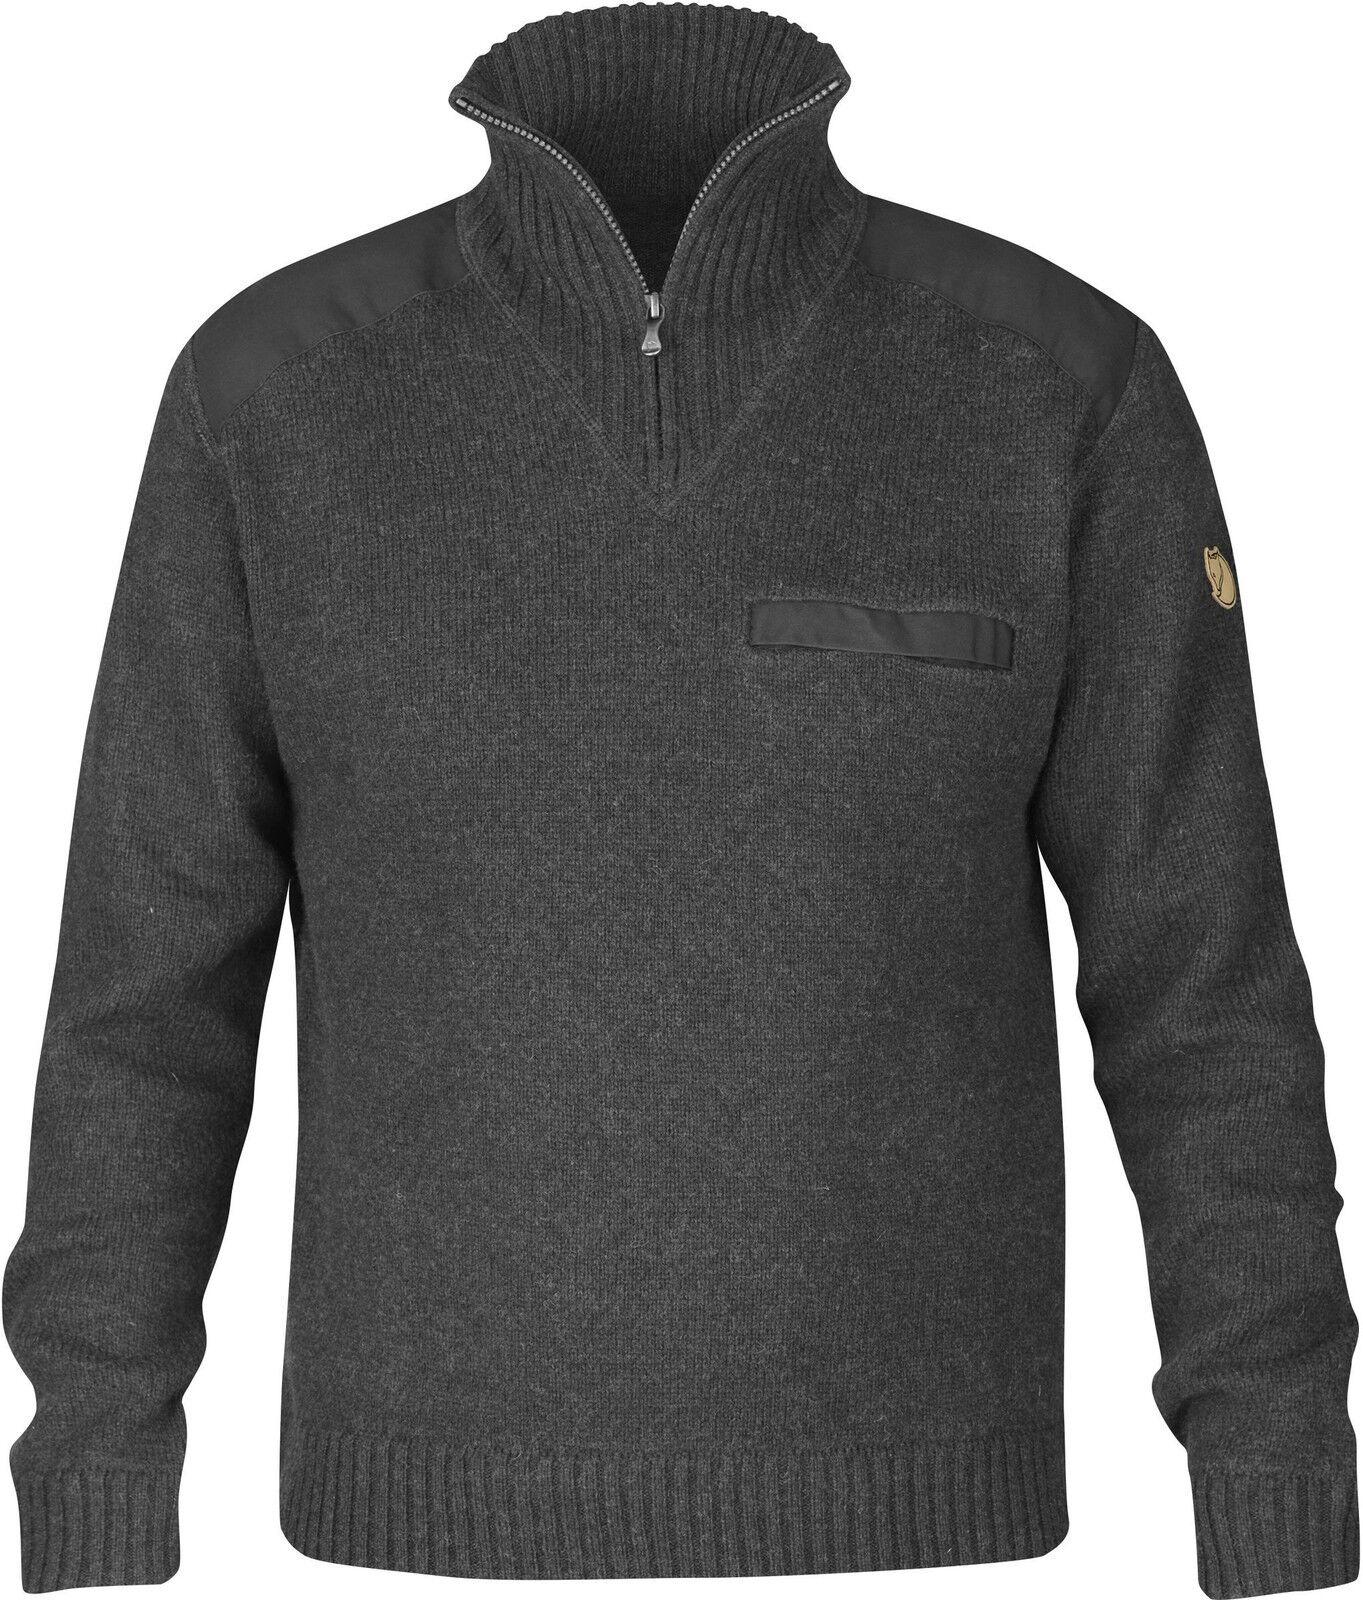 Fjäll Räven Koster Sweater Men Jumper Size XL Dark  Grey 90487  cheap wholesale